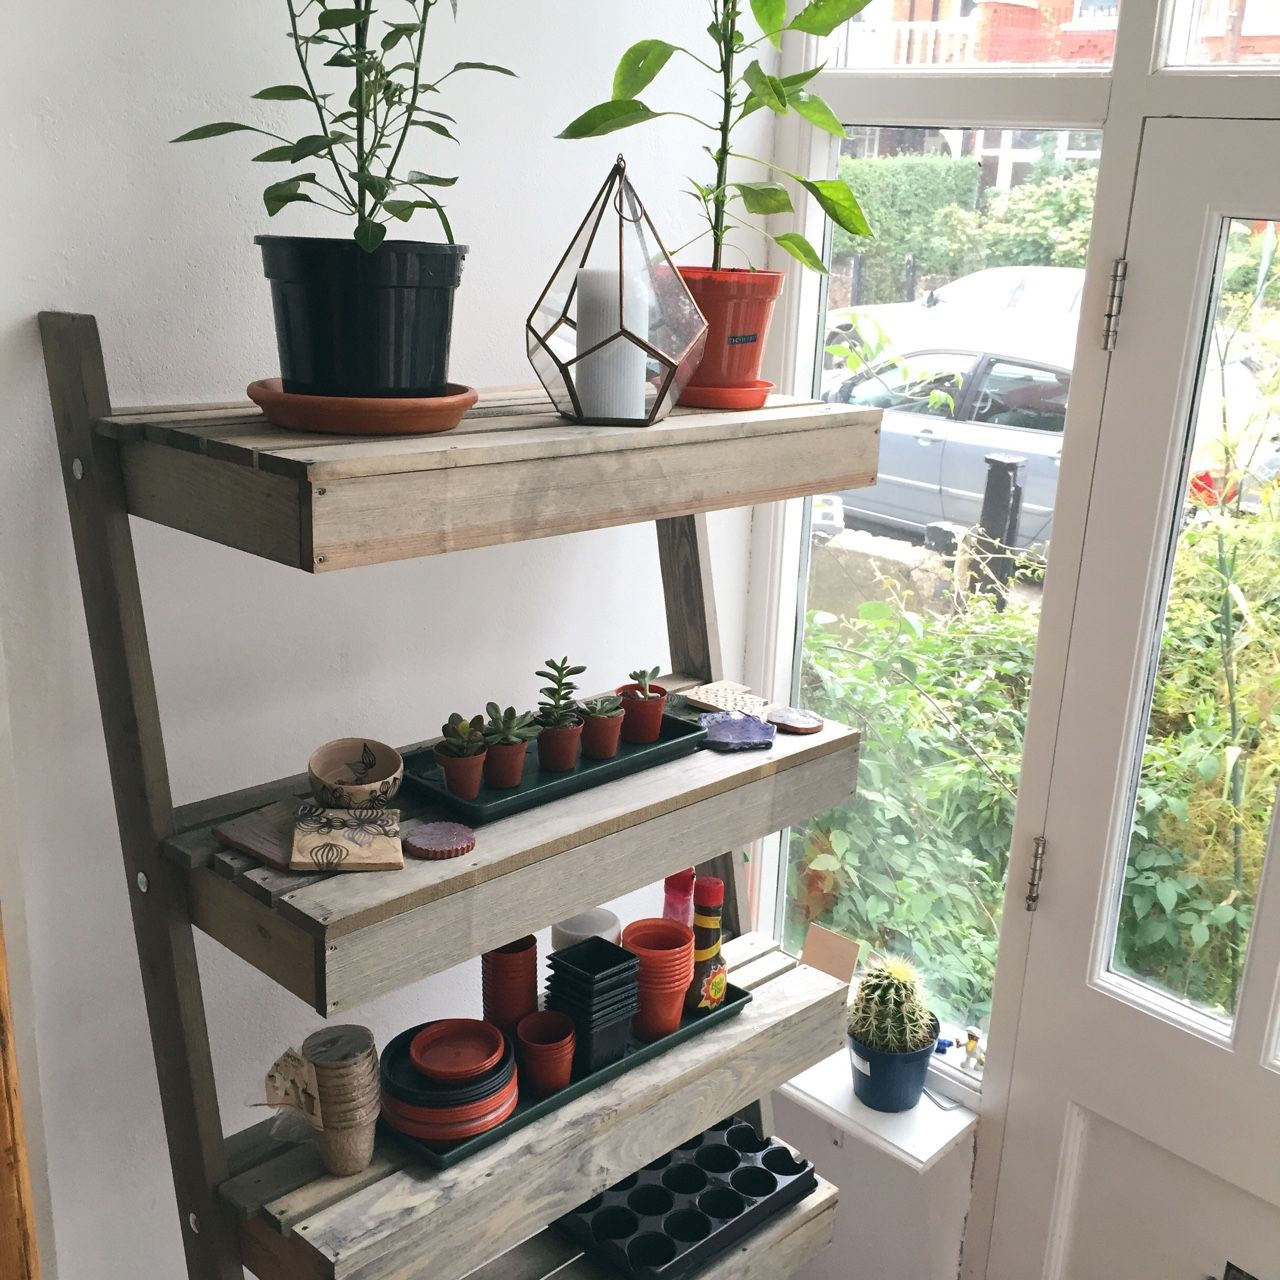 Greenhouse Shelves, Shelves